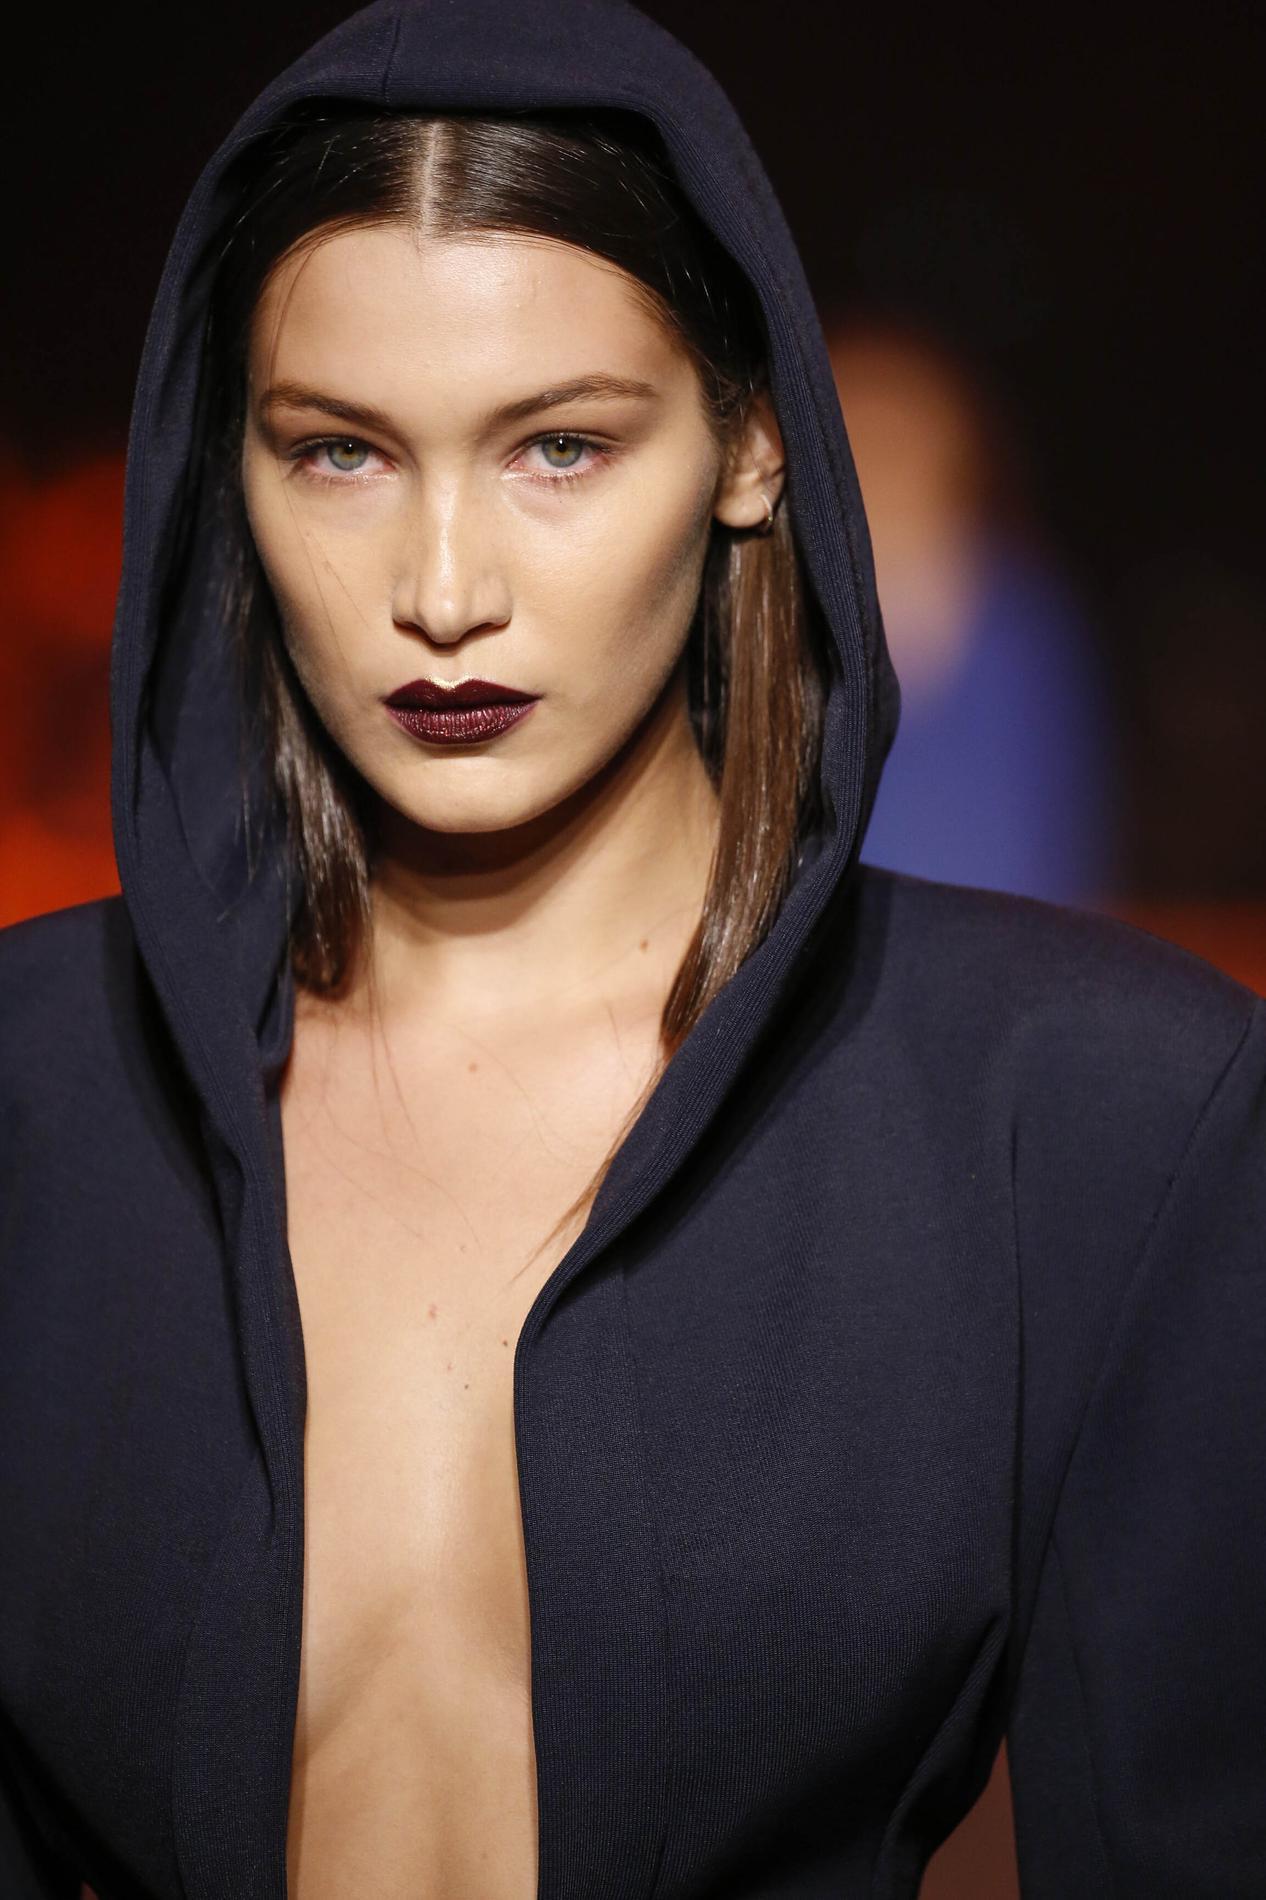 Gigi Hadid Irina Shayk Kendall Jenner Le Retour Des